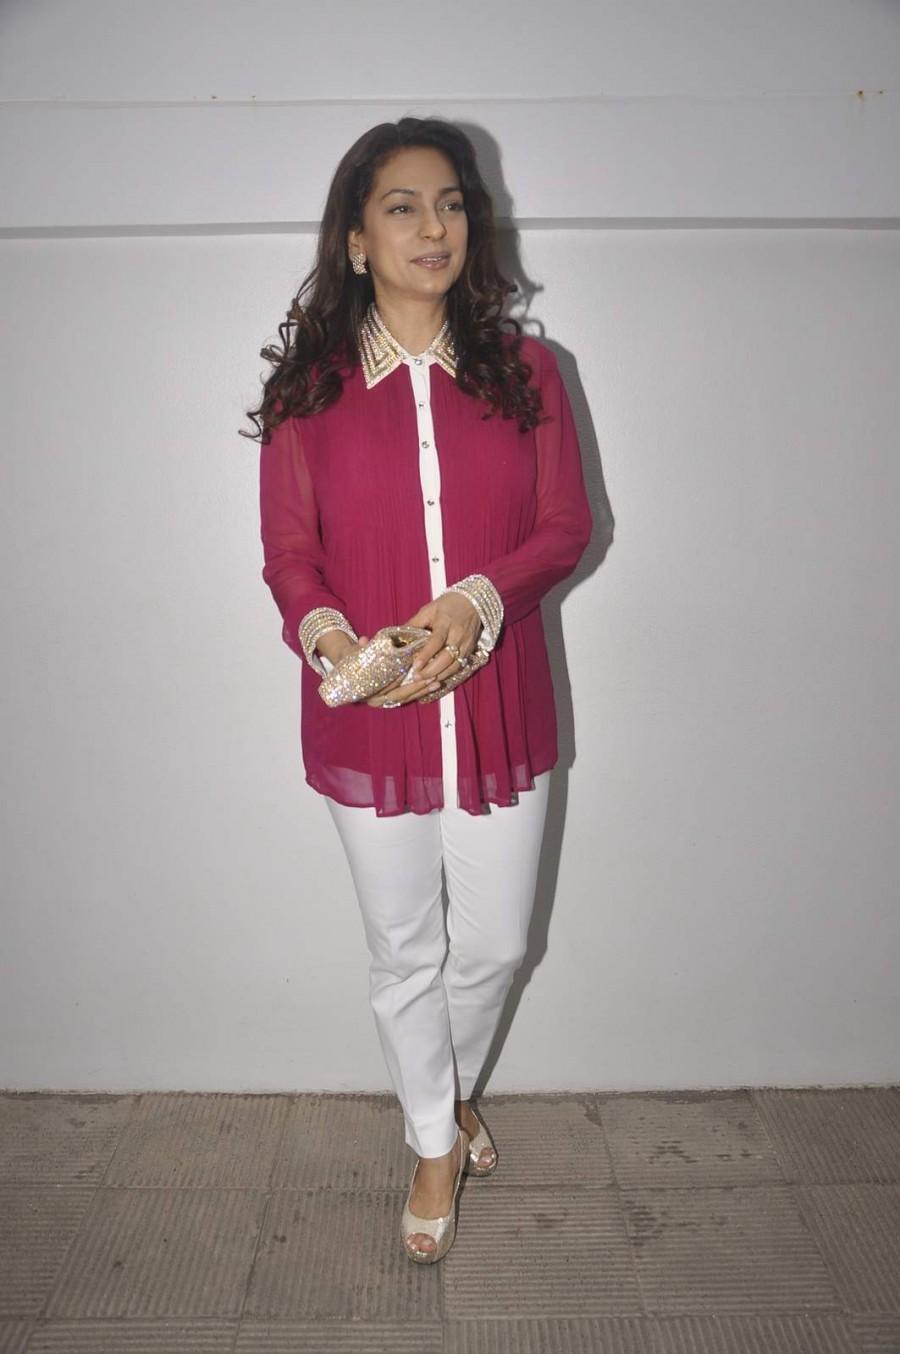 Nishka Lulla,Nishka Lulla wedding bash,celebs at Nishka Lulla bash,Juhi chawla,Juhi chawla photos,Juhi chawla latest